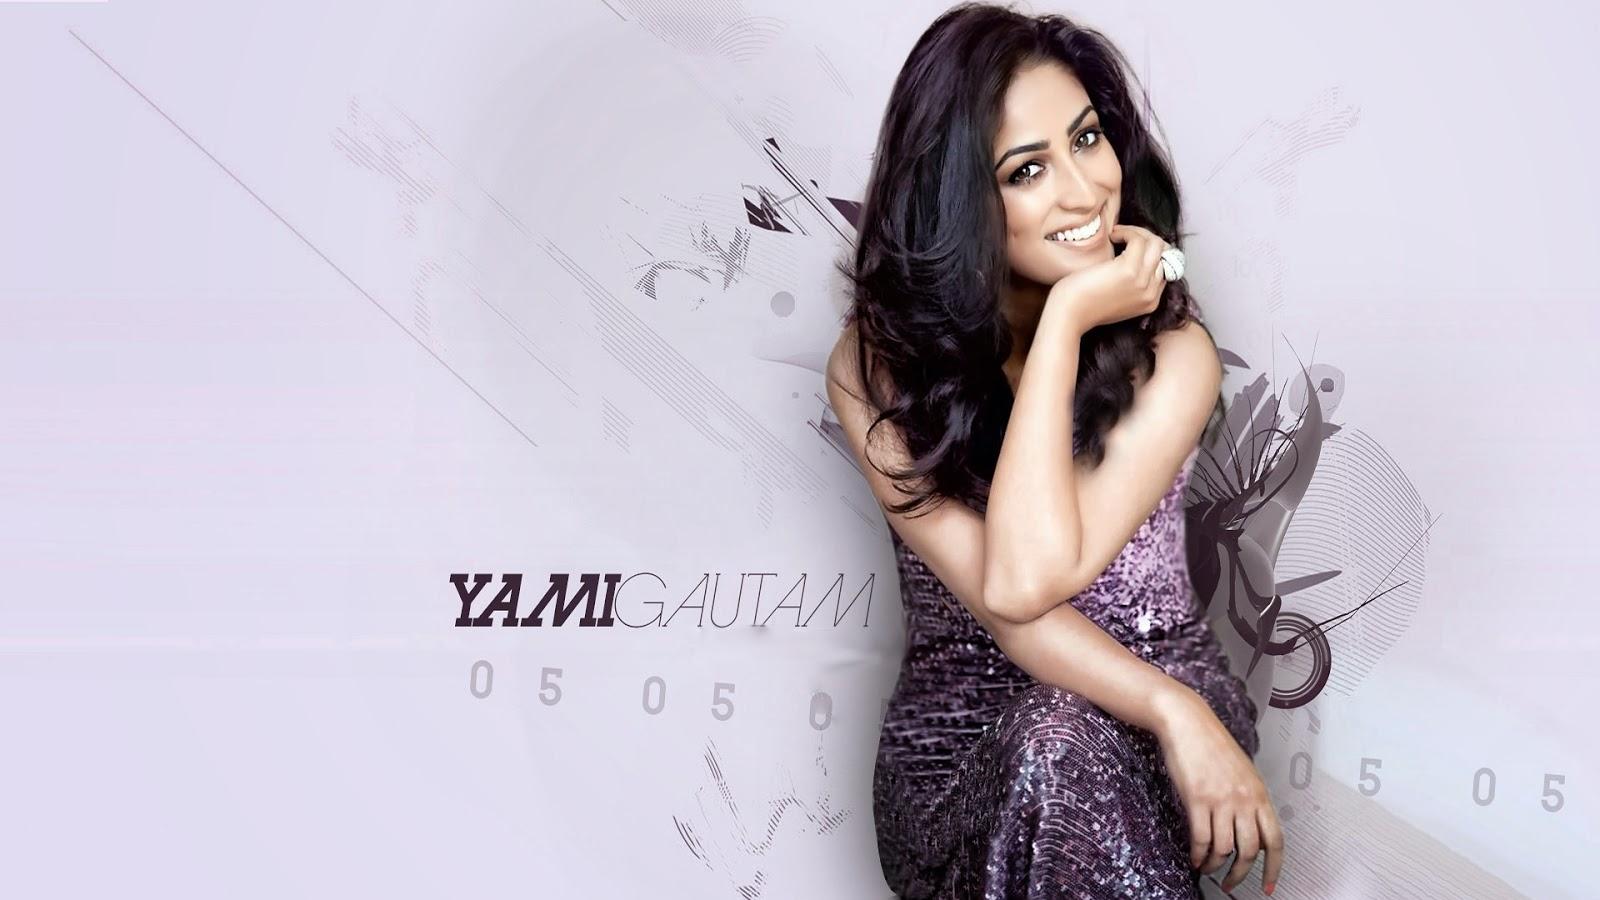 Yami Gautam Hd Pics: Yami Gautam Latest HD Wallpapers Free Download